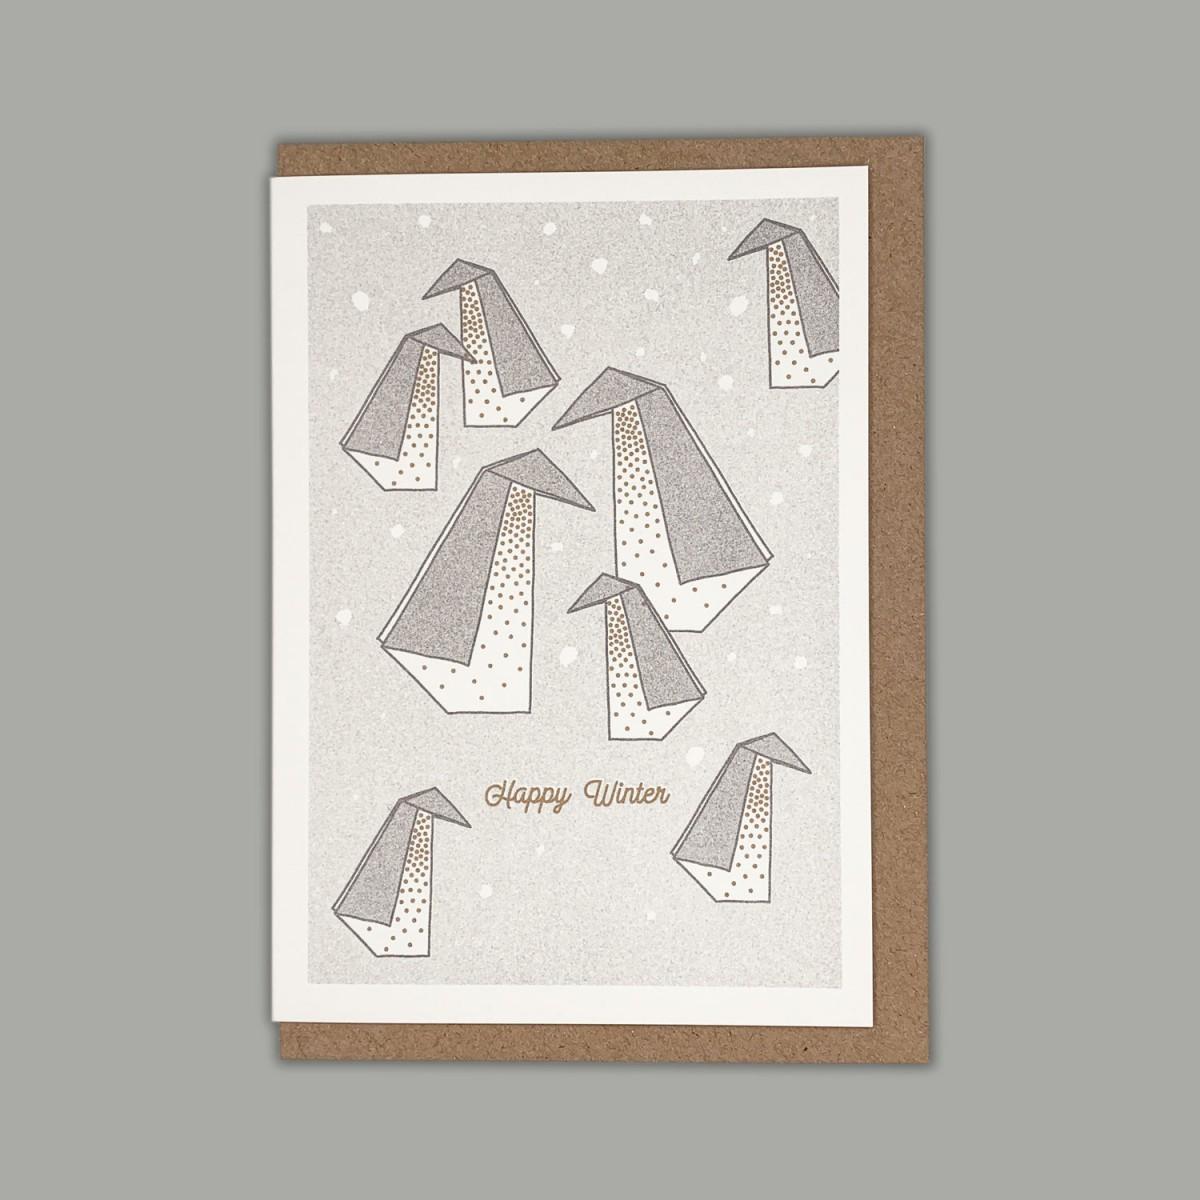 Feingeladen // LIKE ORIGAMI // Penguins »Happy Winter« (GRGD) – A6